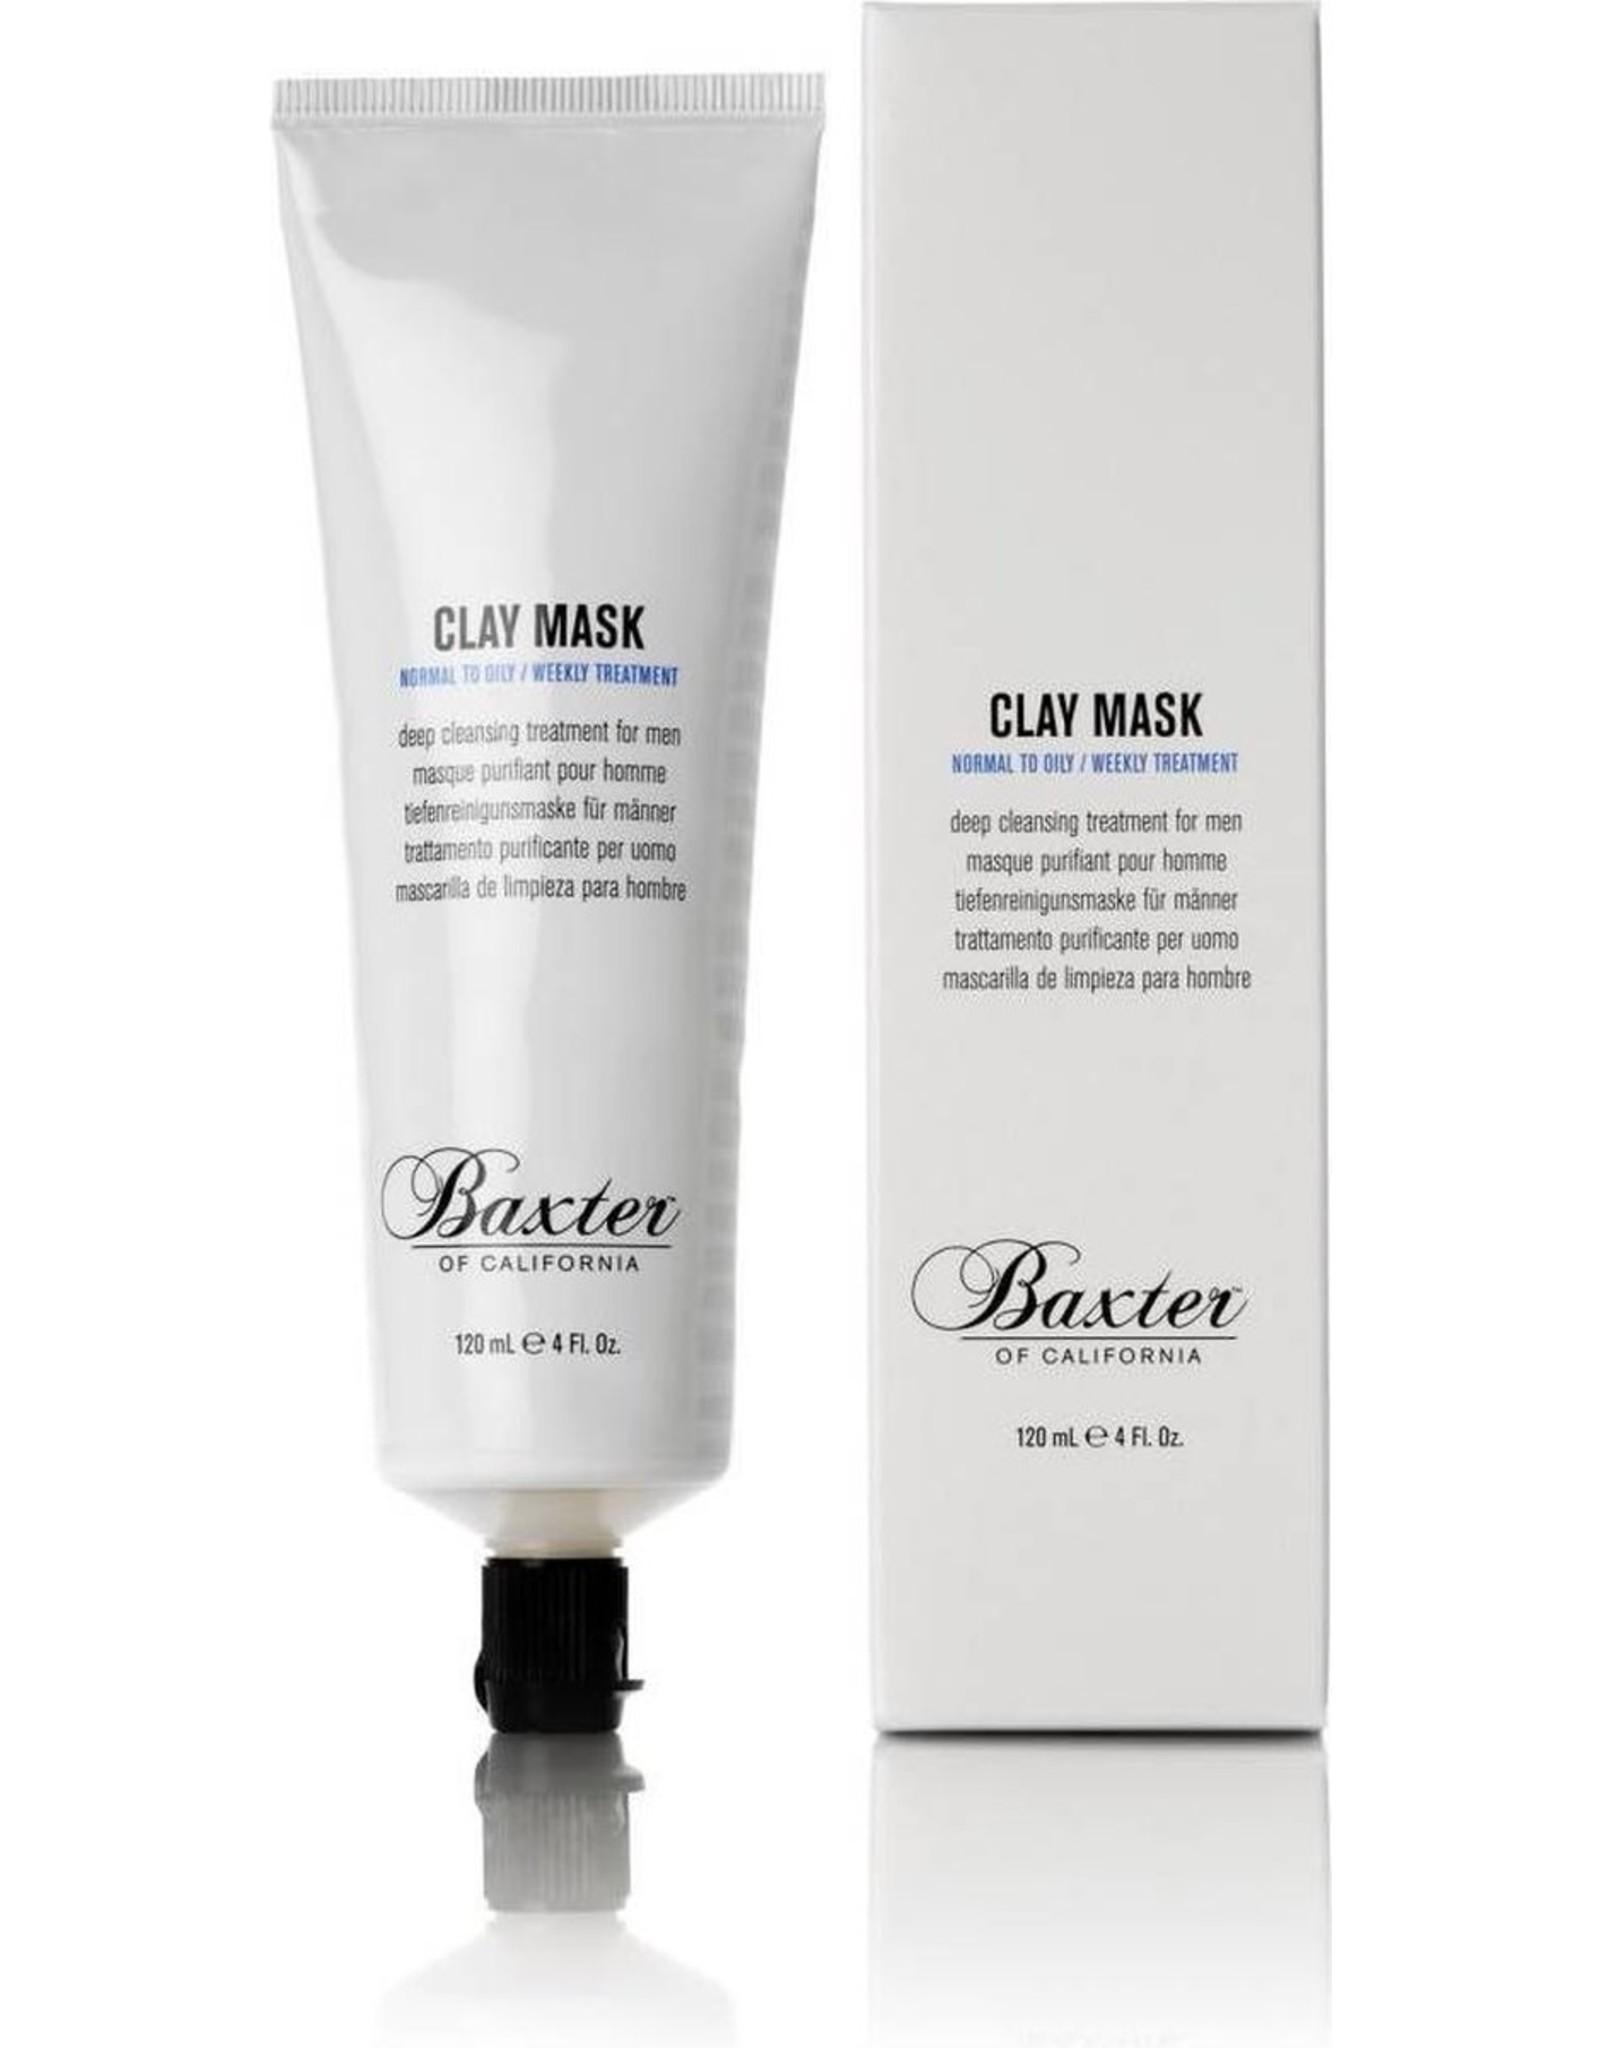 Baxter Clay Mask, 120ml